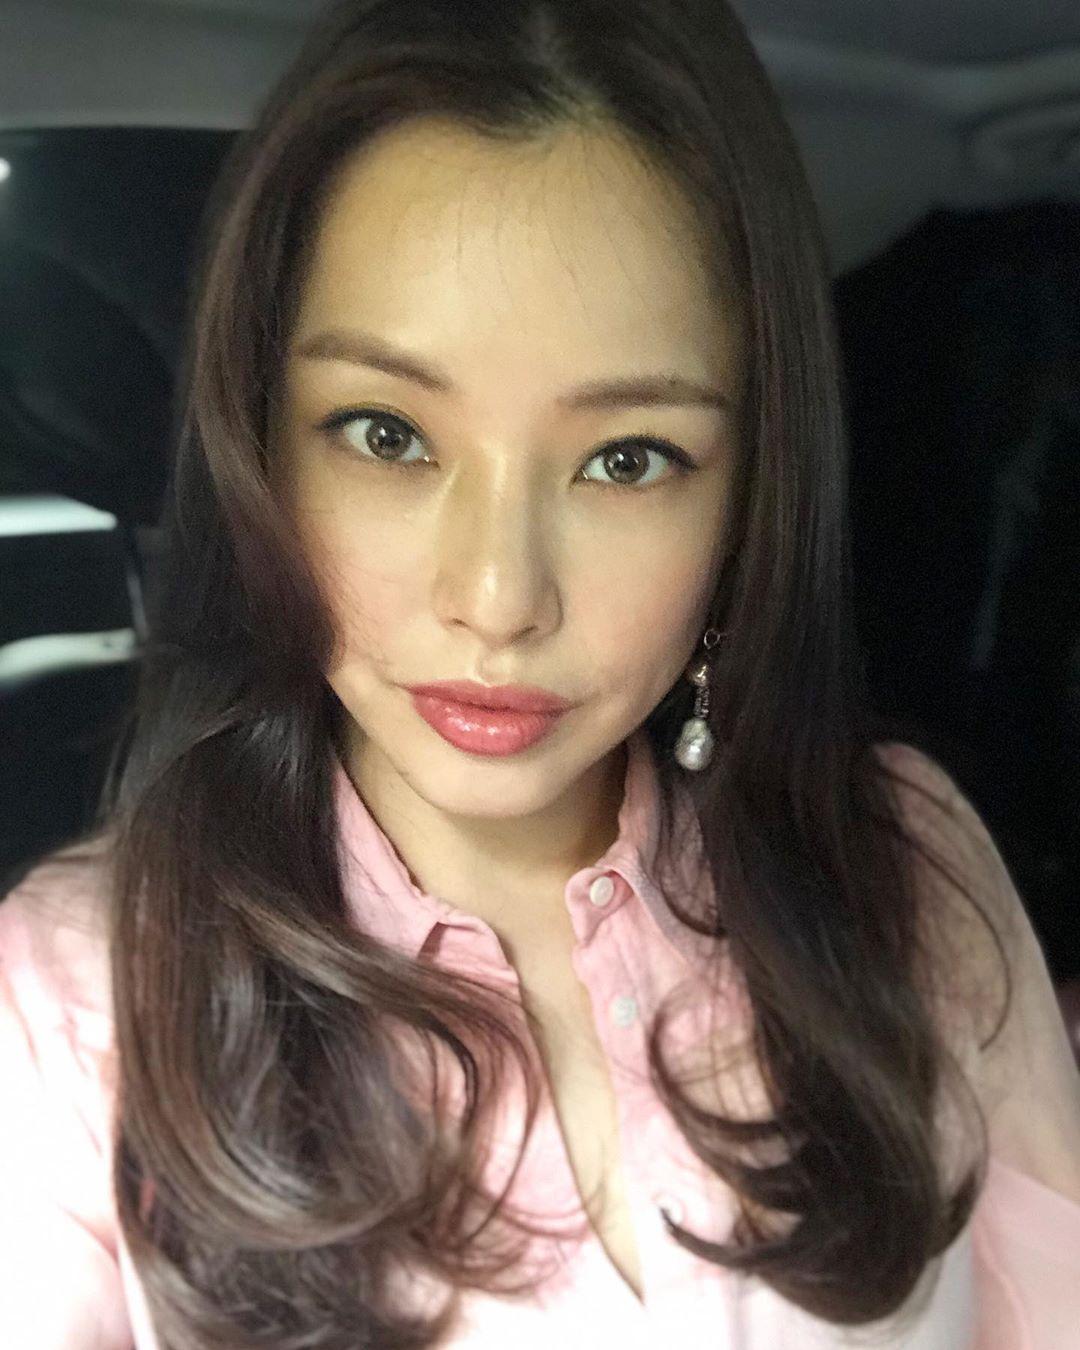 Lee Ha nui south korean actress